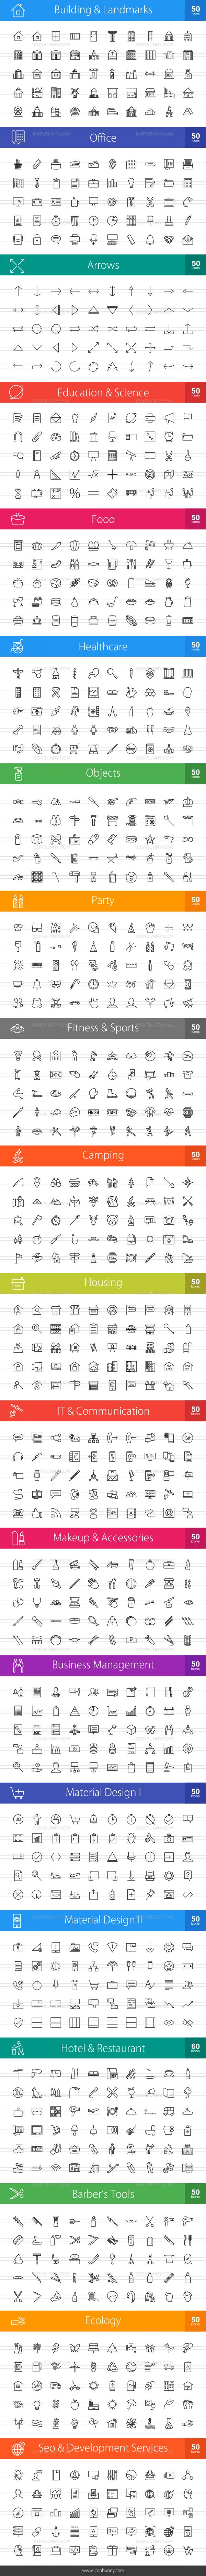 1010 Line Icons Bundle - Preview - IconBunny